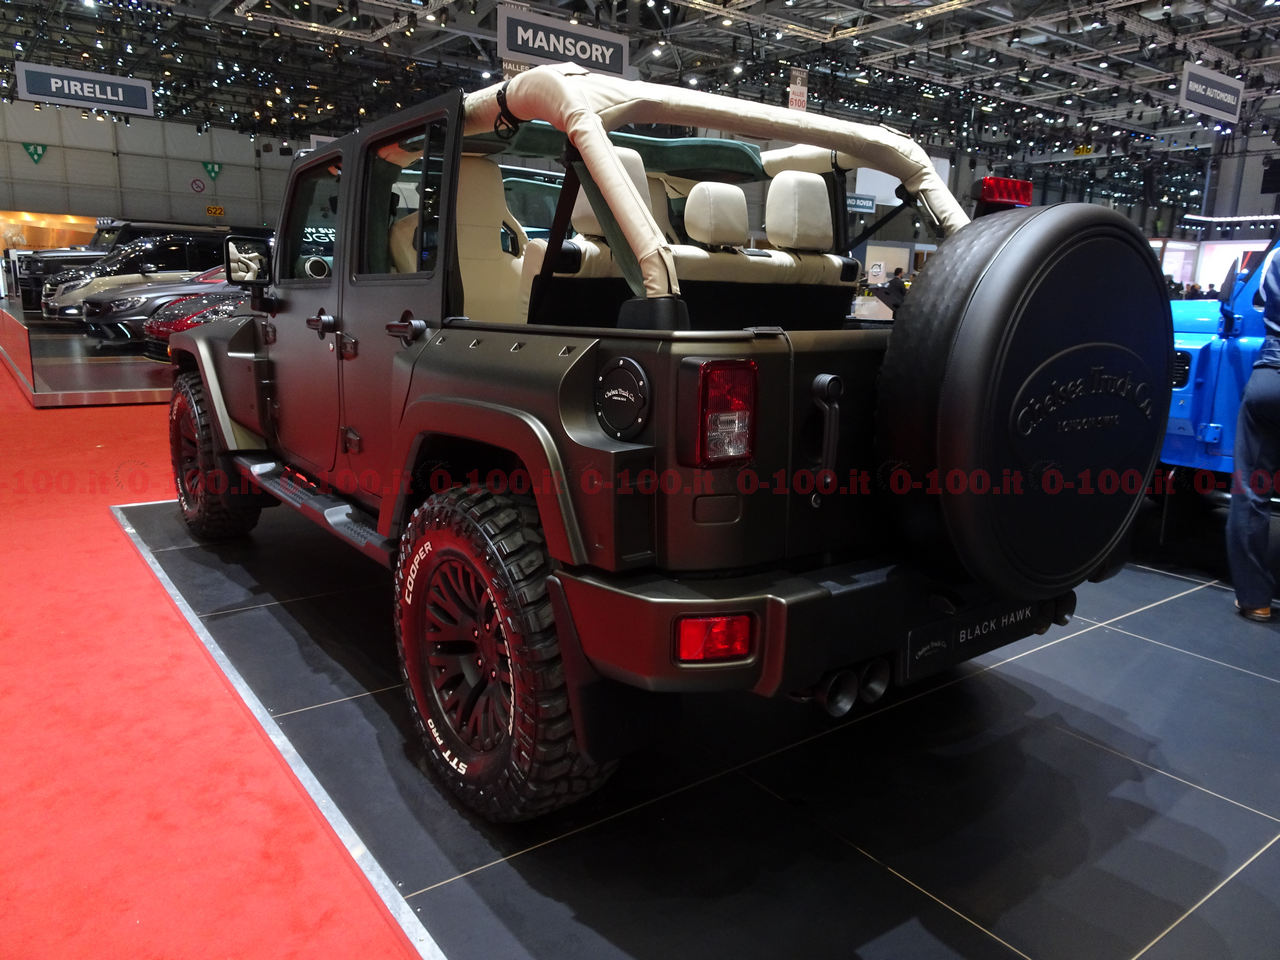 Geneve-ginevra-geneva-2017_tuning-khan-design-chelsea-truck-jeep-wrangler_0-100_2